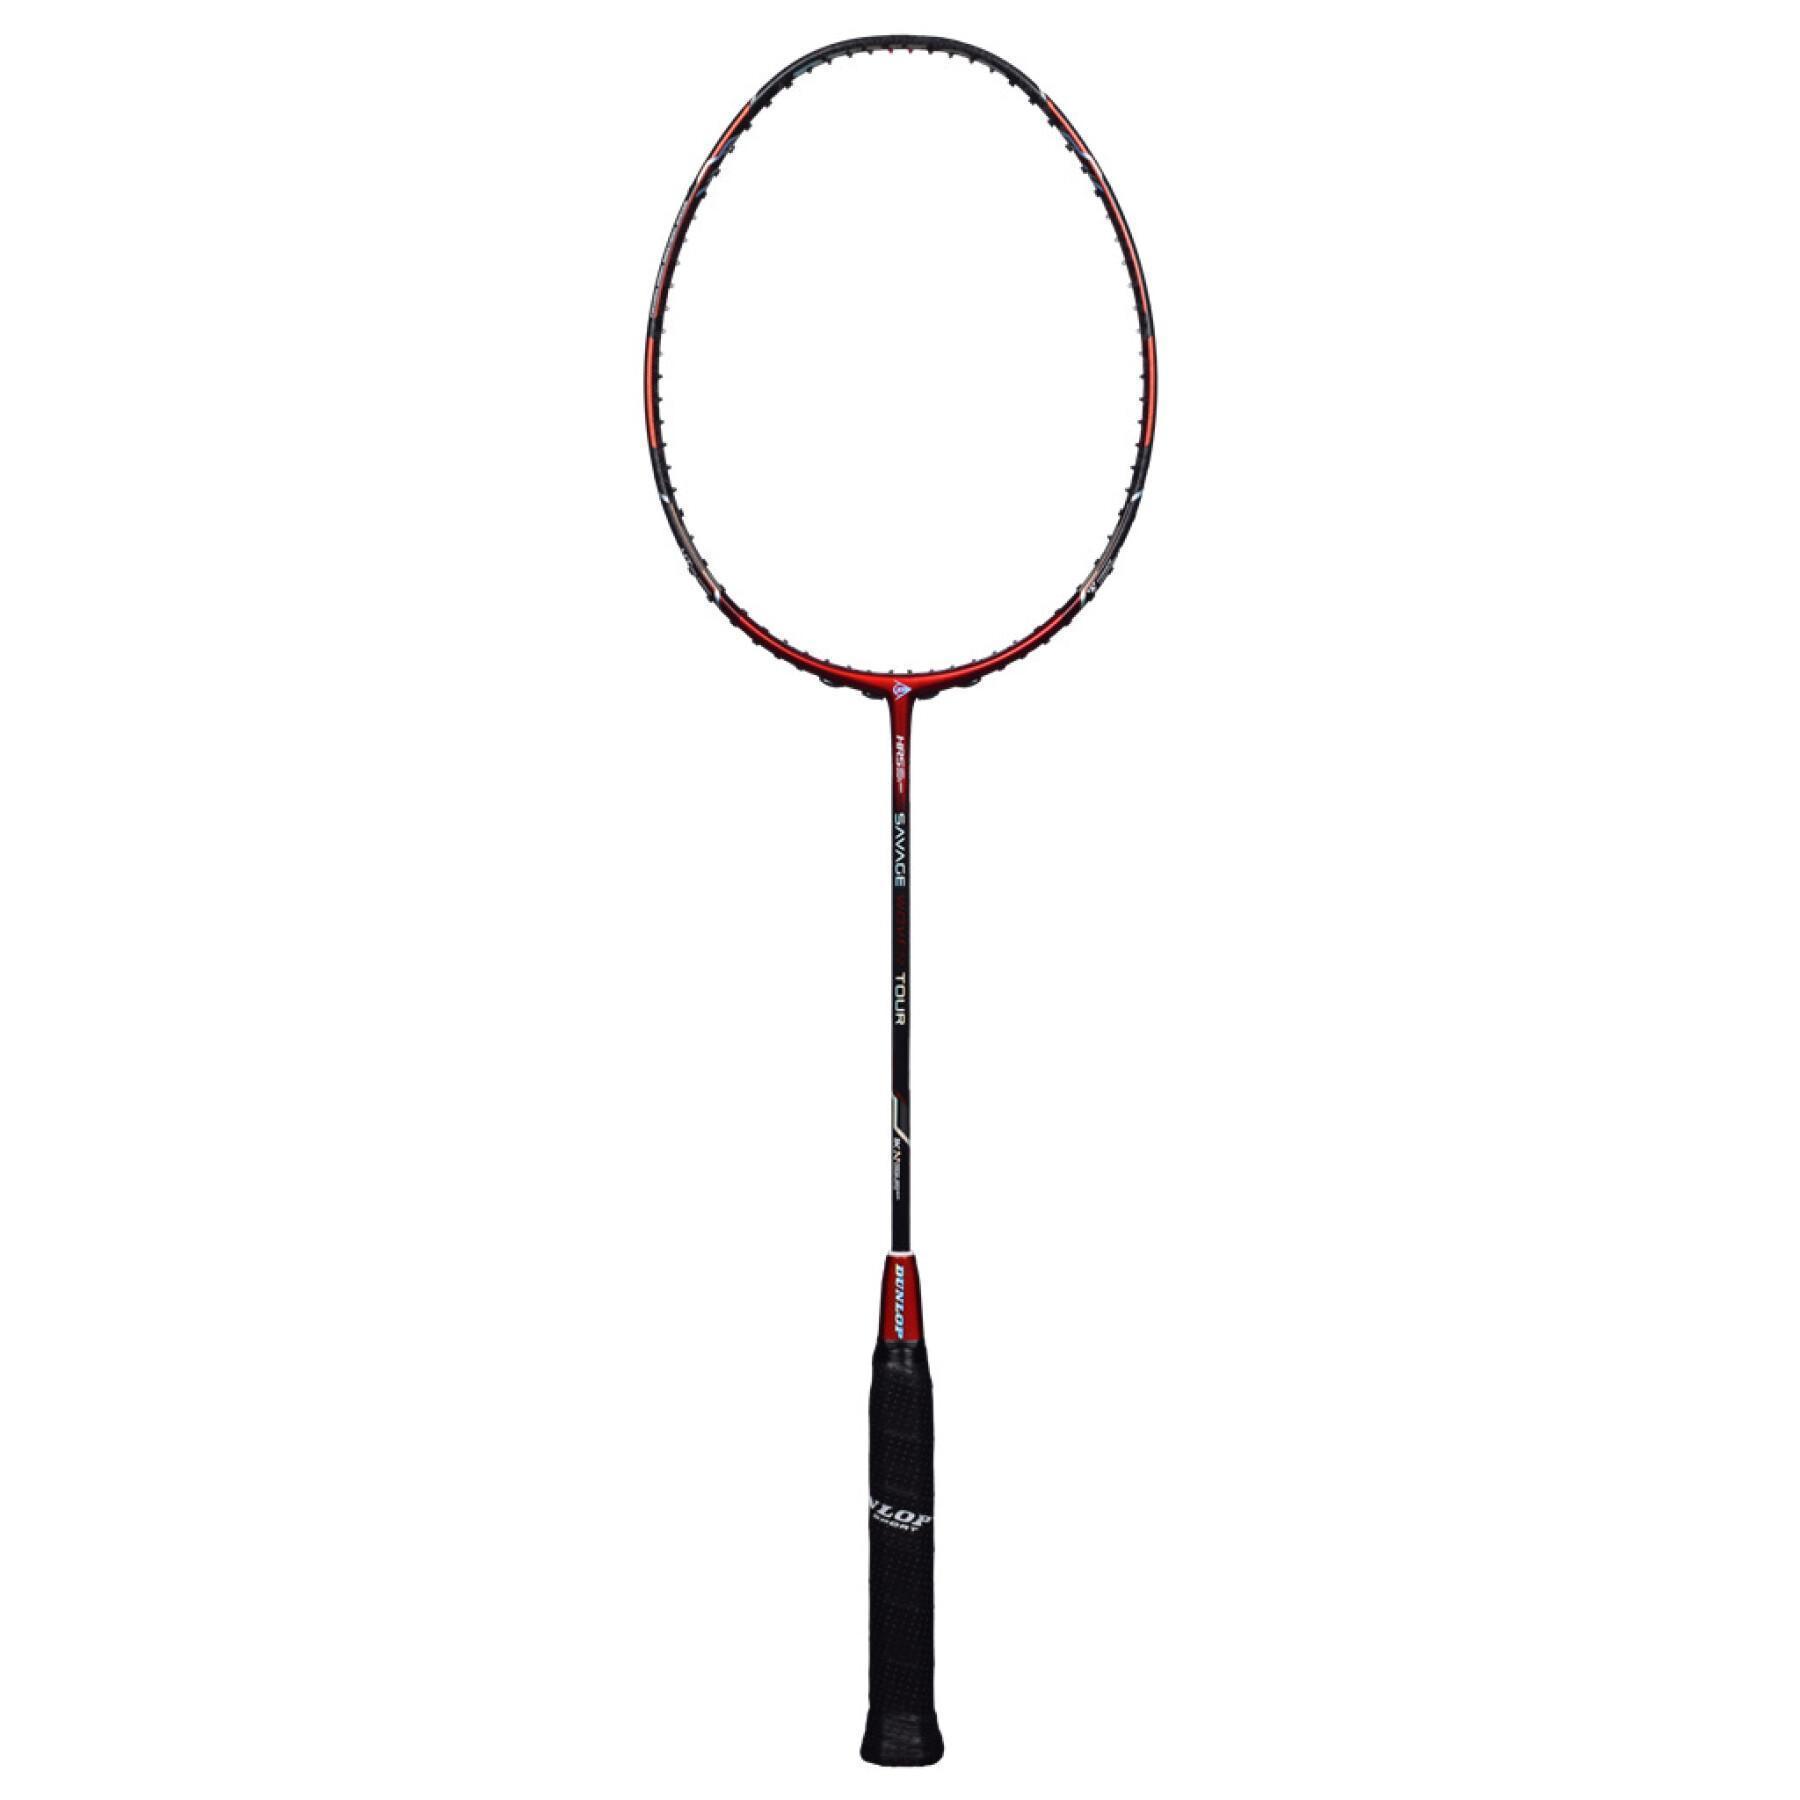 Racket Dunlop nanoblade savage woven tour